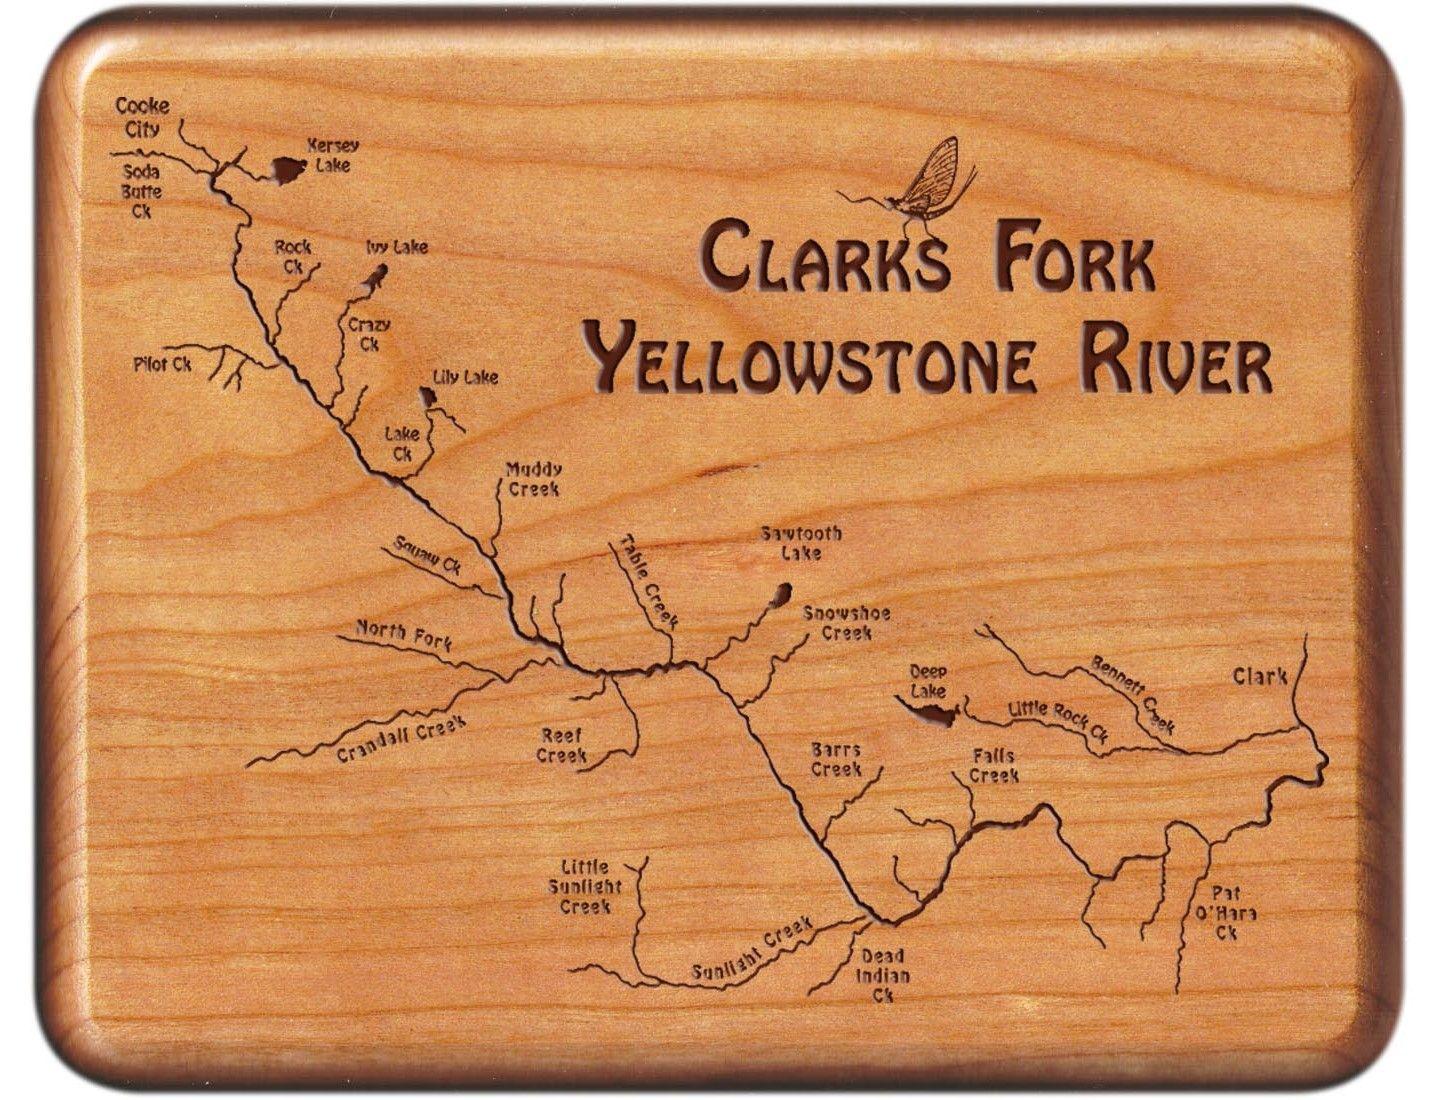 Clarks Fork Yellowstone River Map Fly Box MontanaWyoming - Montana rivers map